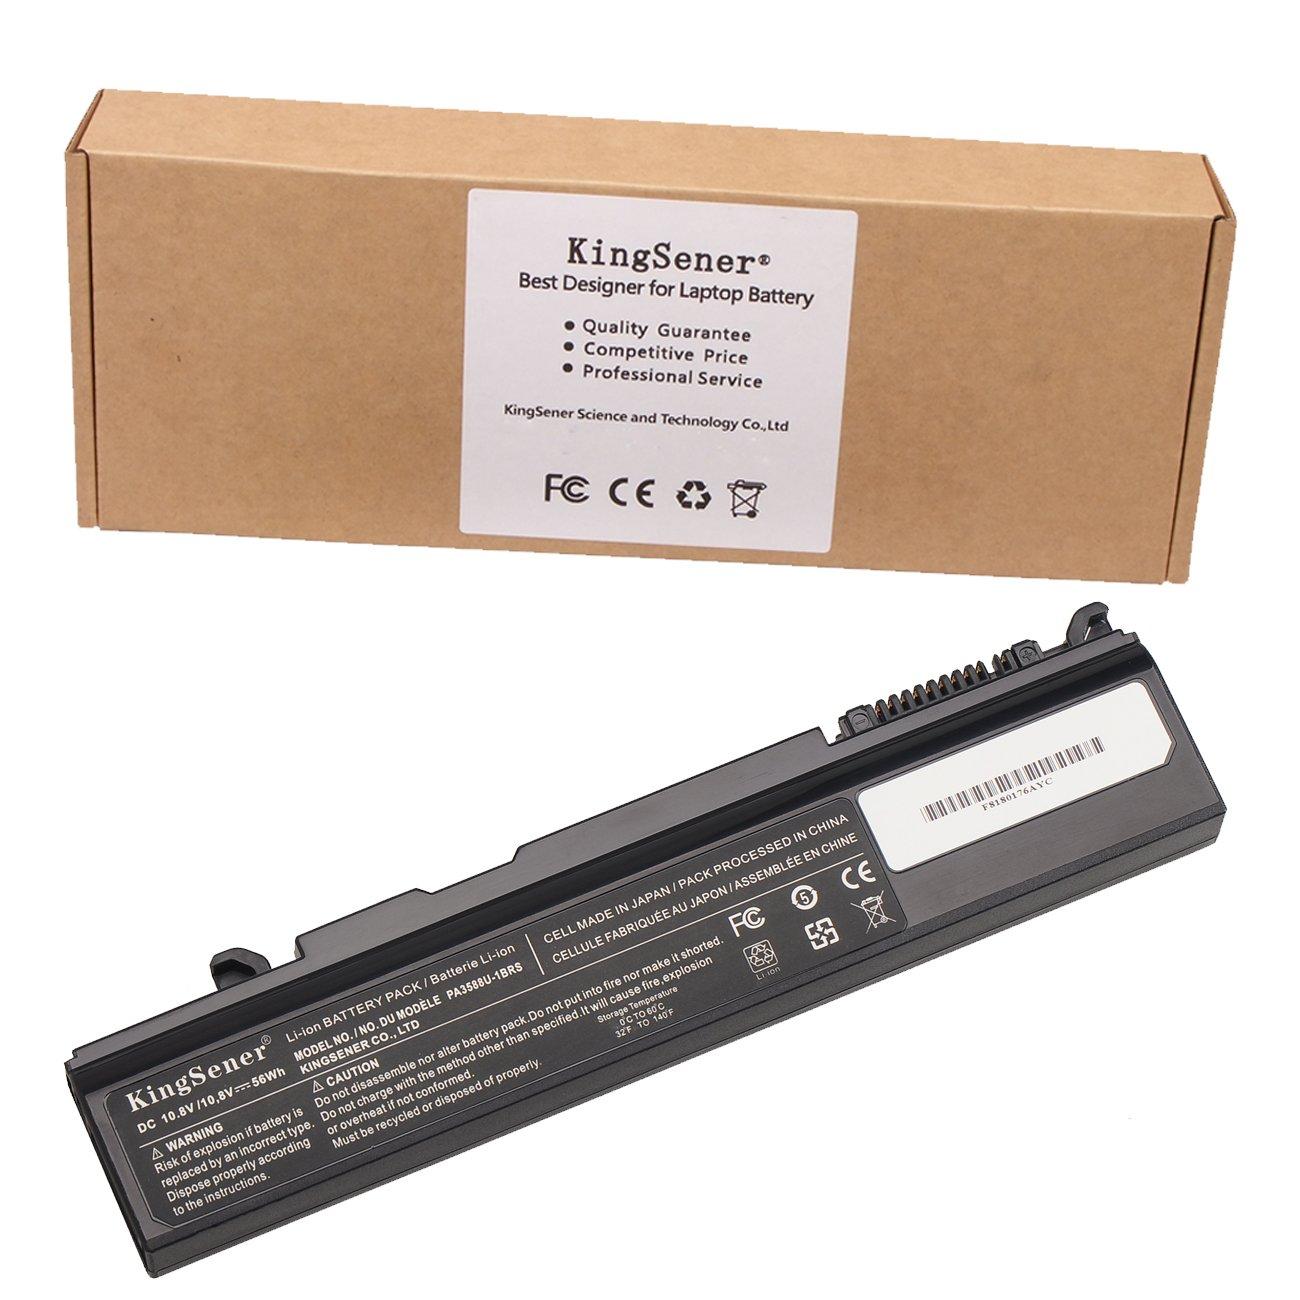 KingSener 10.8V 56WH PA3588U-1BRS Battery For Toshiba Portege M300 M500 S100 PA3588U-1BRS PABAS048 PABAS049 PA3356U-1BRS PA3356U-1BAS PA3356U-1BRL ...